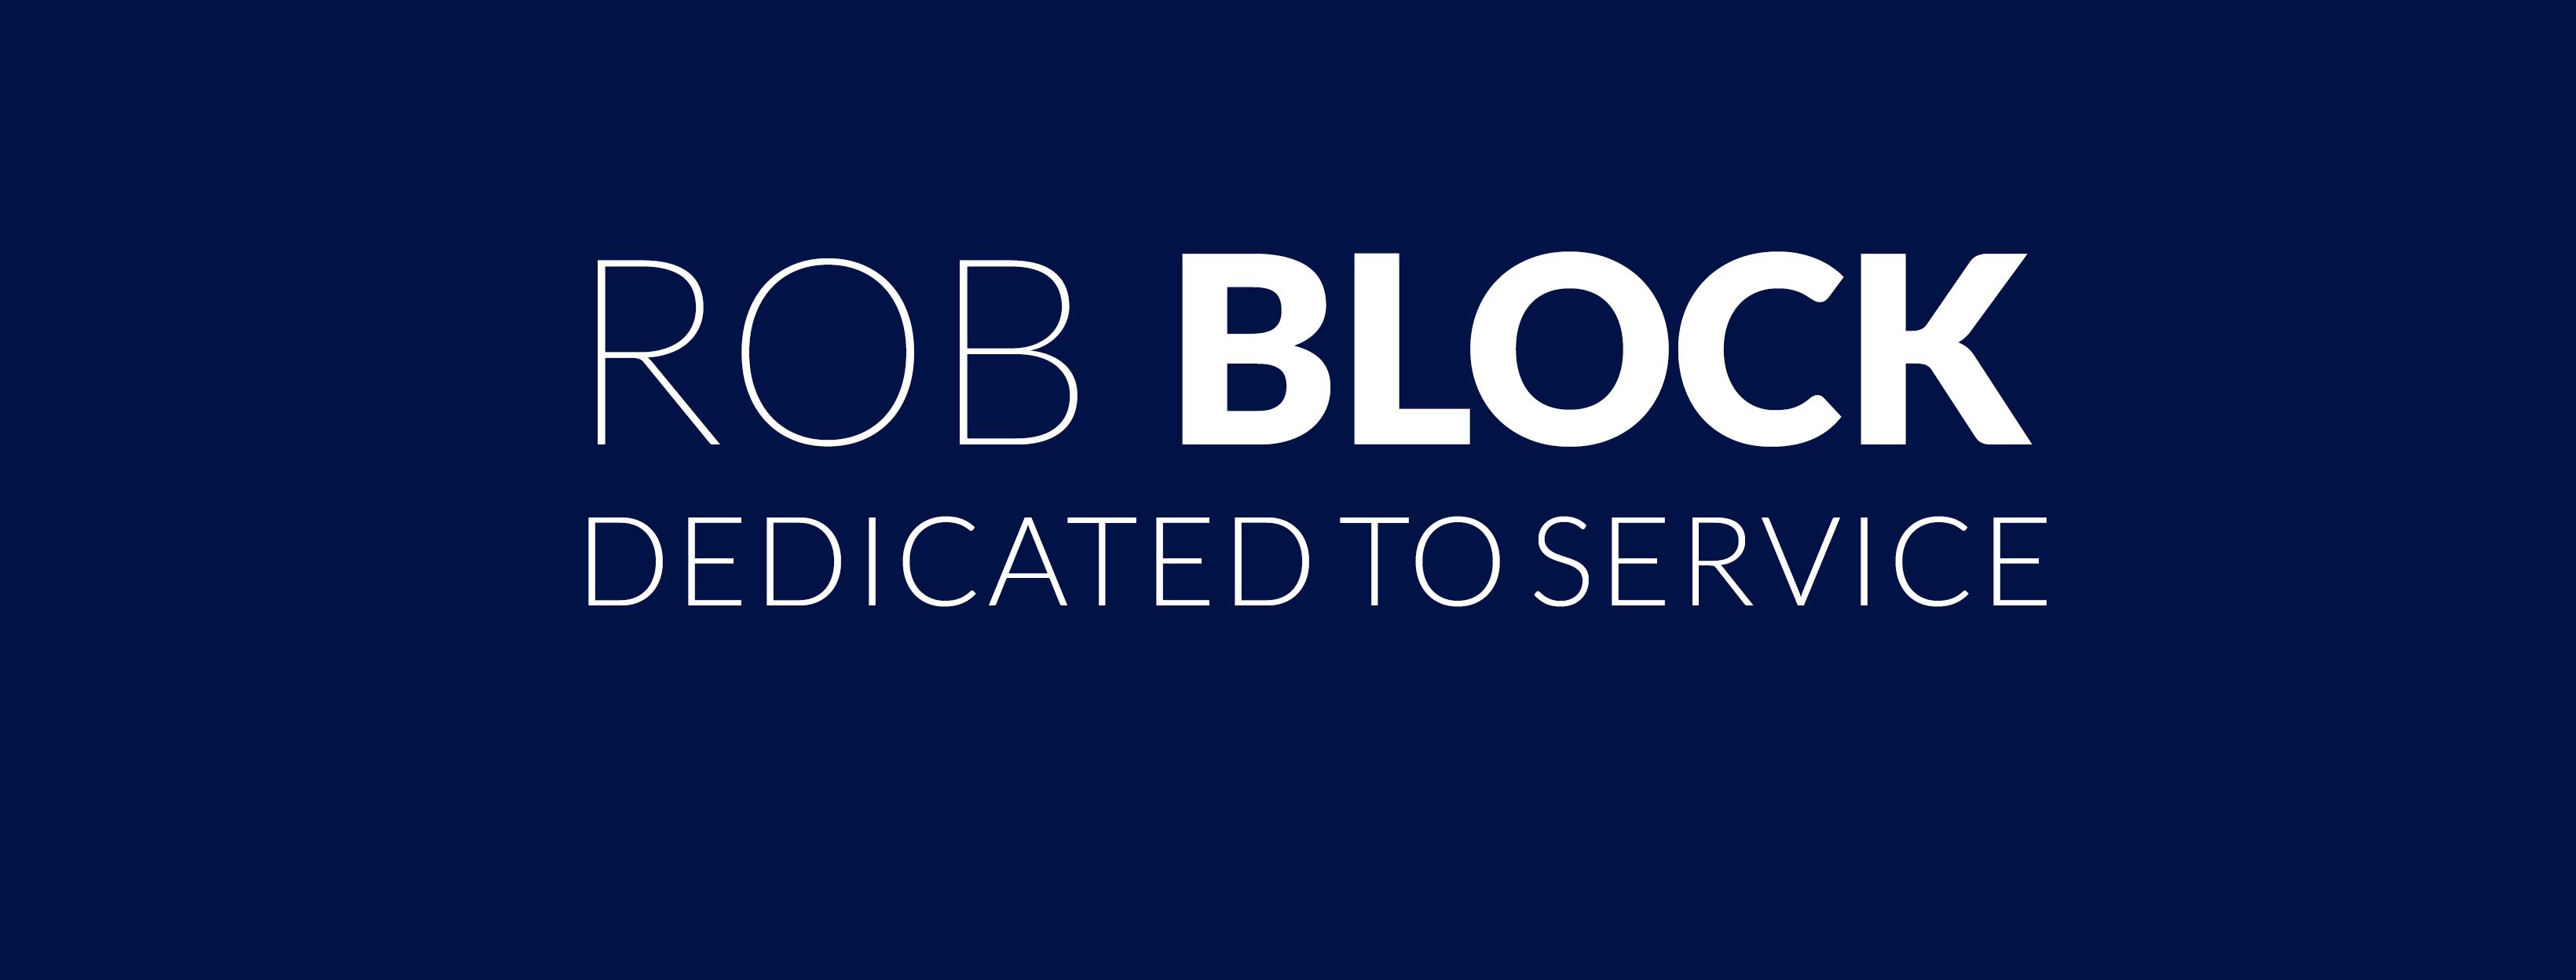 Rob Block